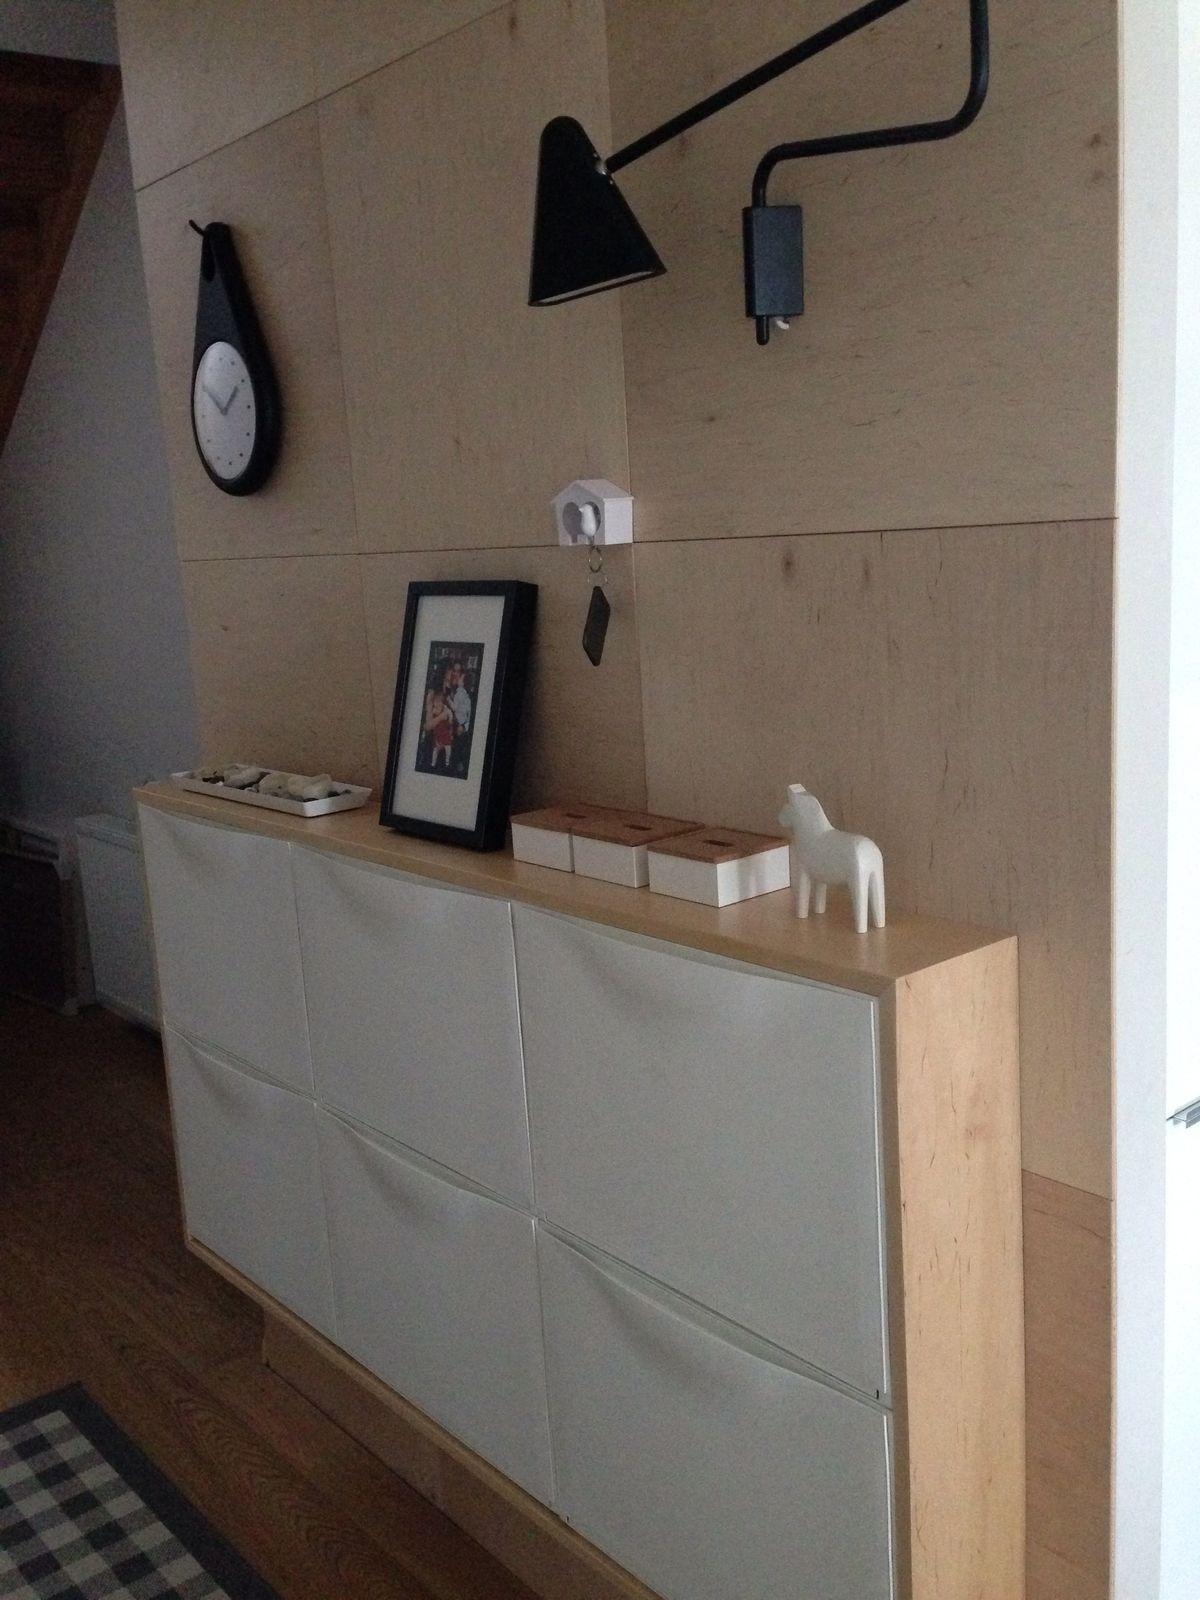 Hallway storage cabinet  fdbcfafbeebg  pixels  déco